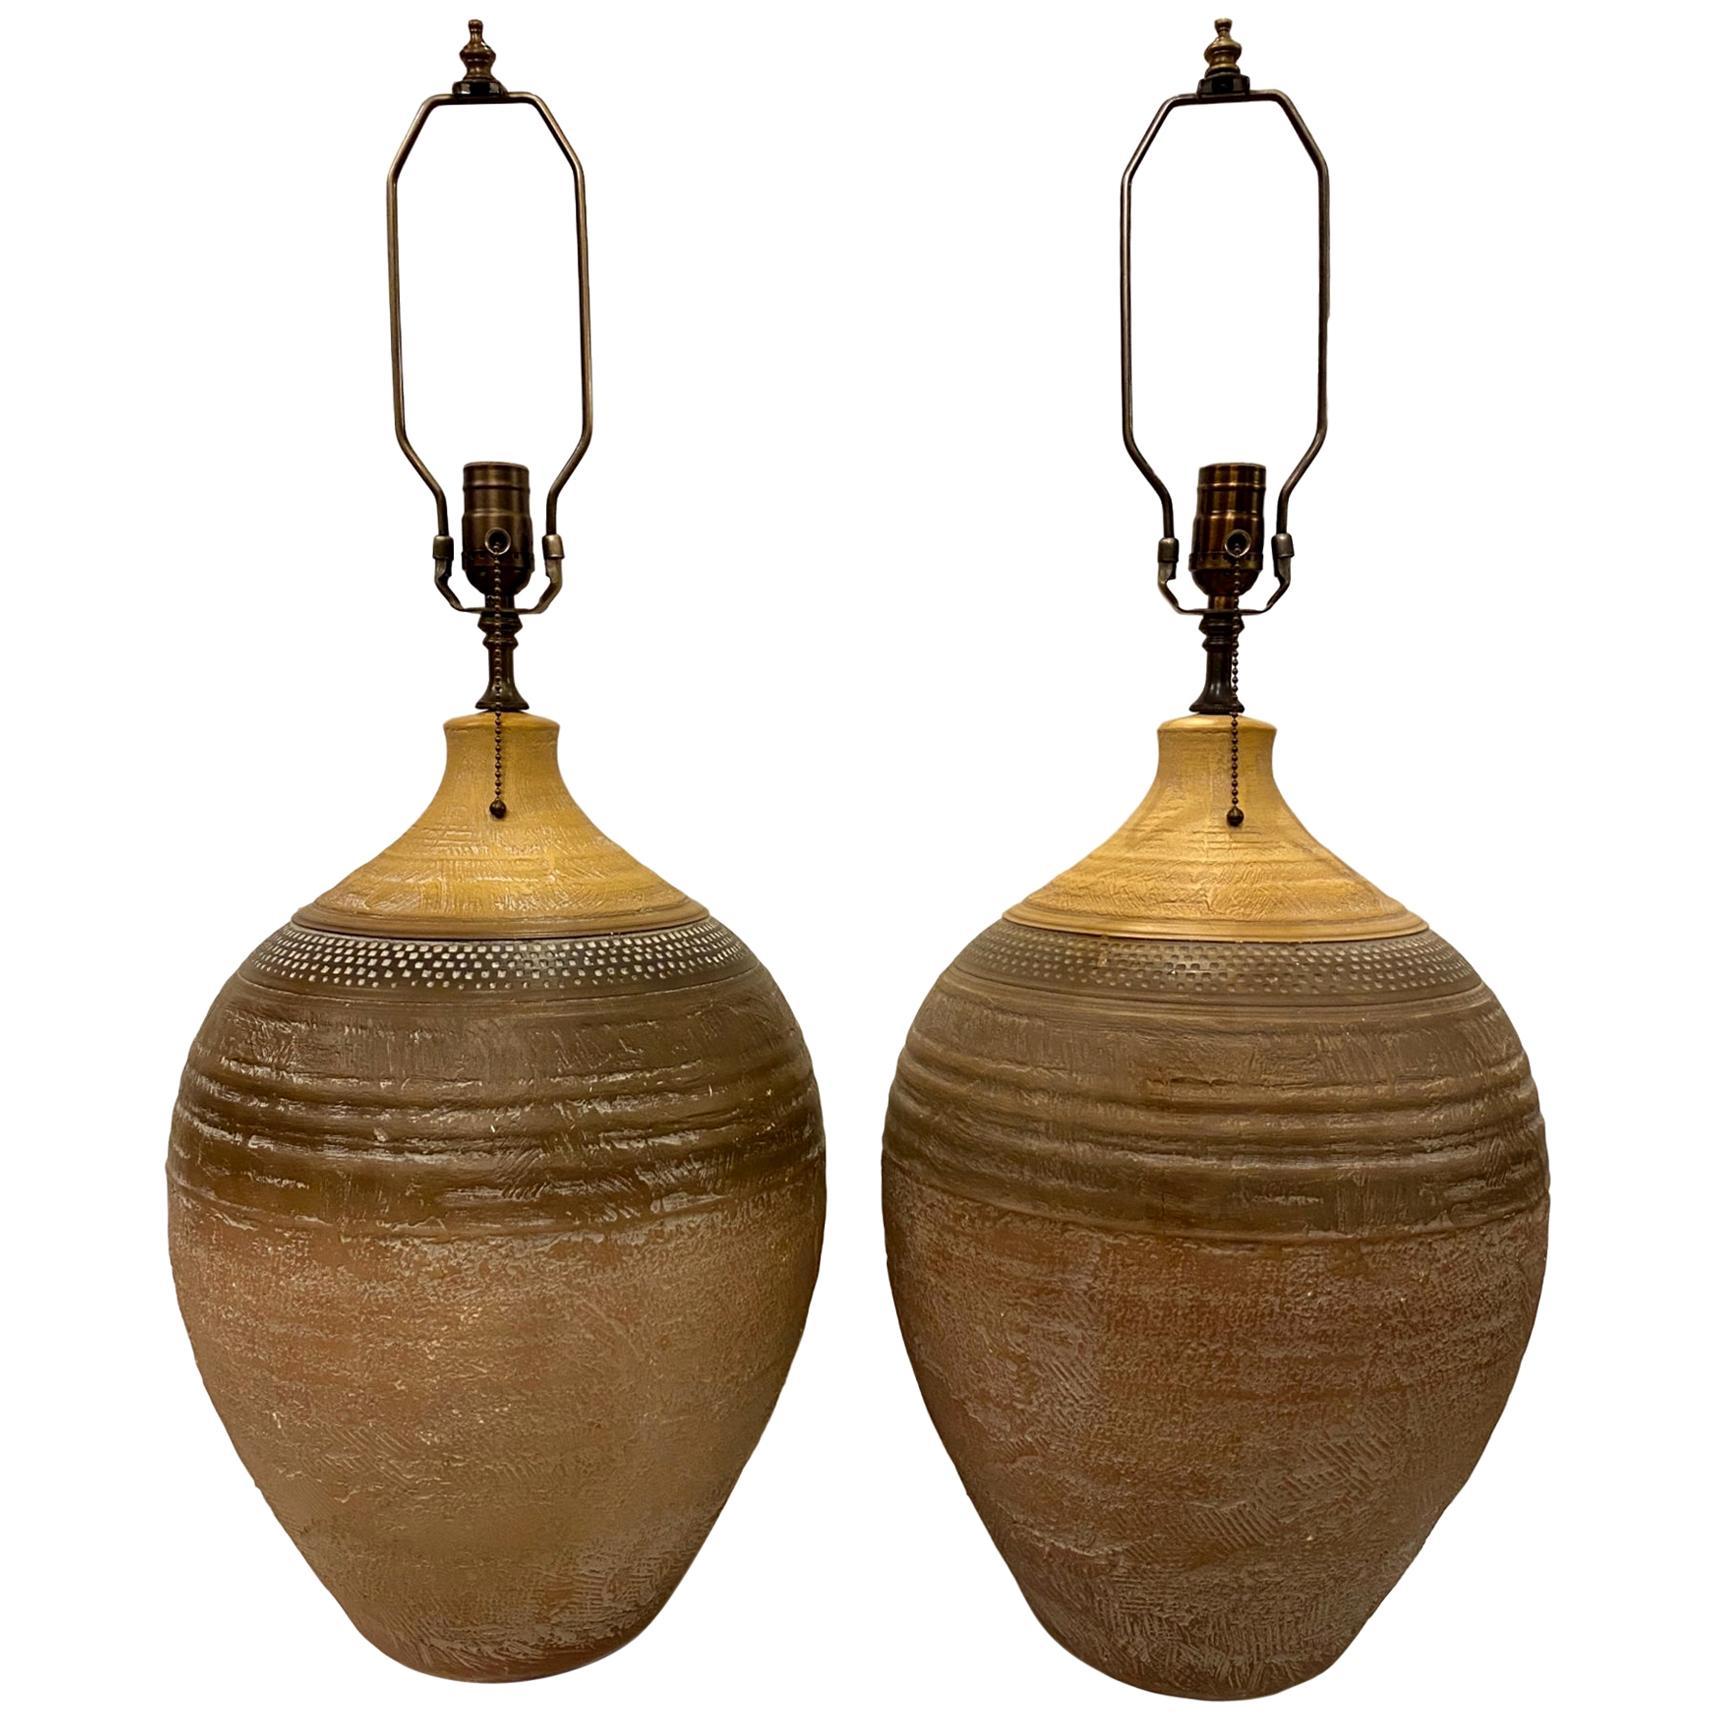 Pair of Large Italian Ceramic Table Lamps